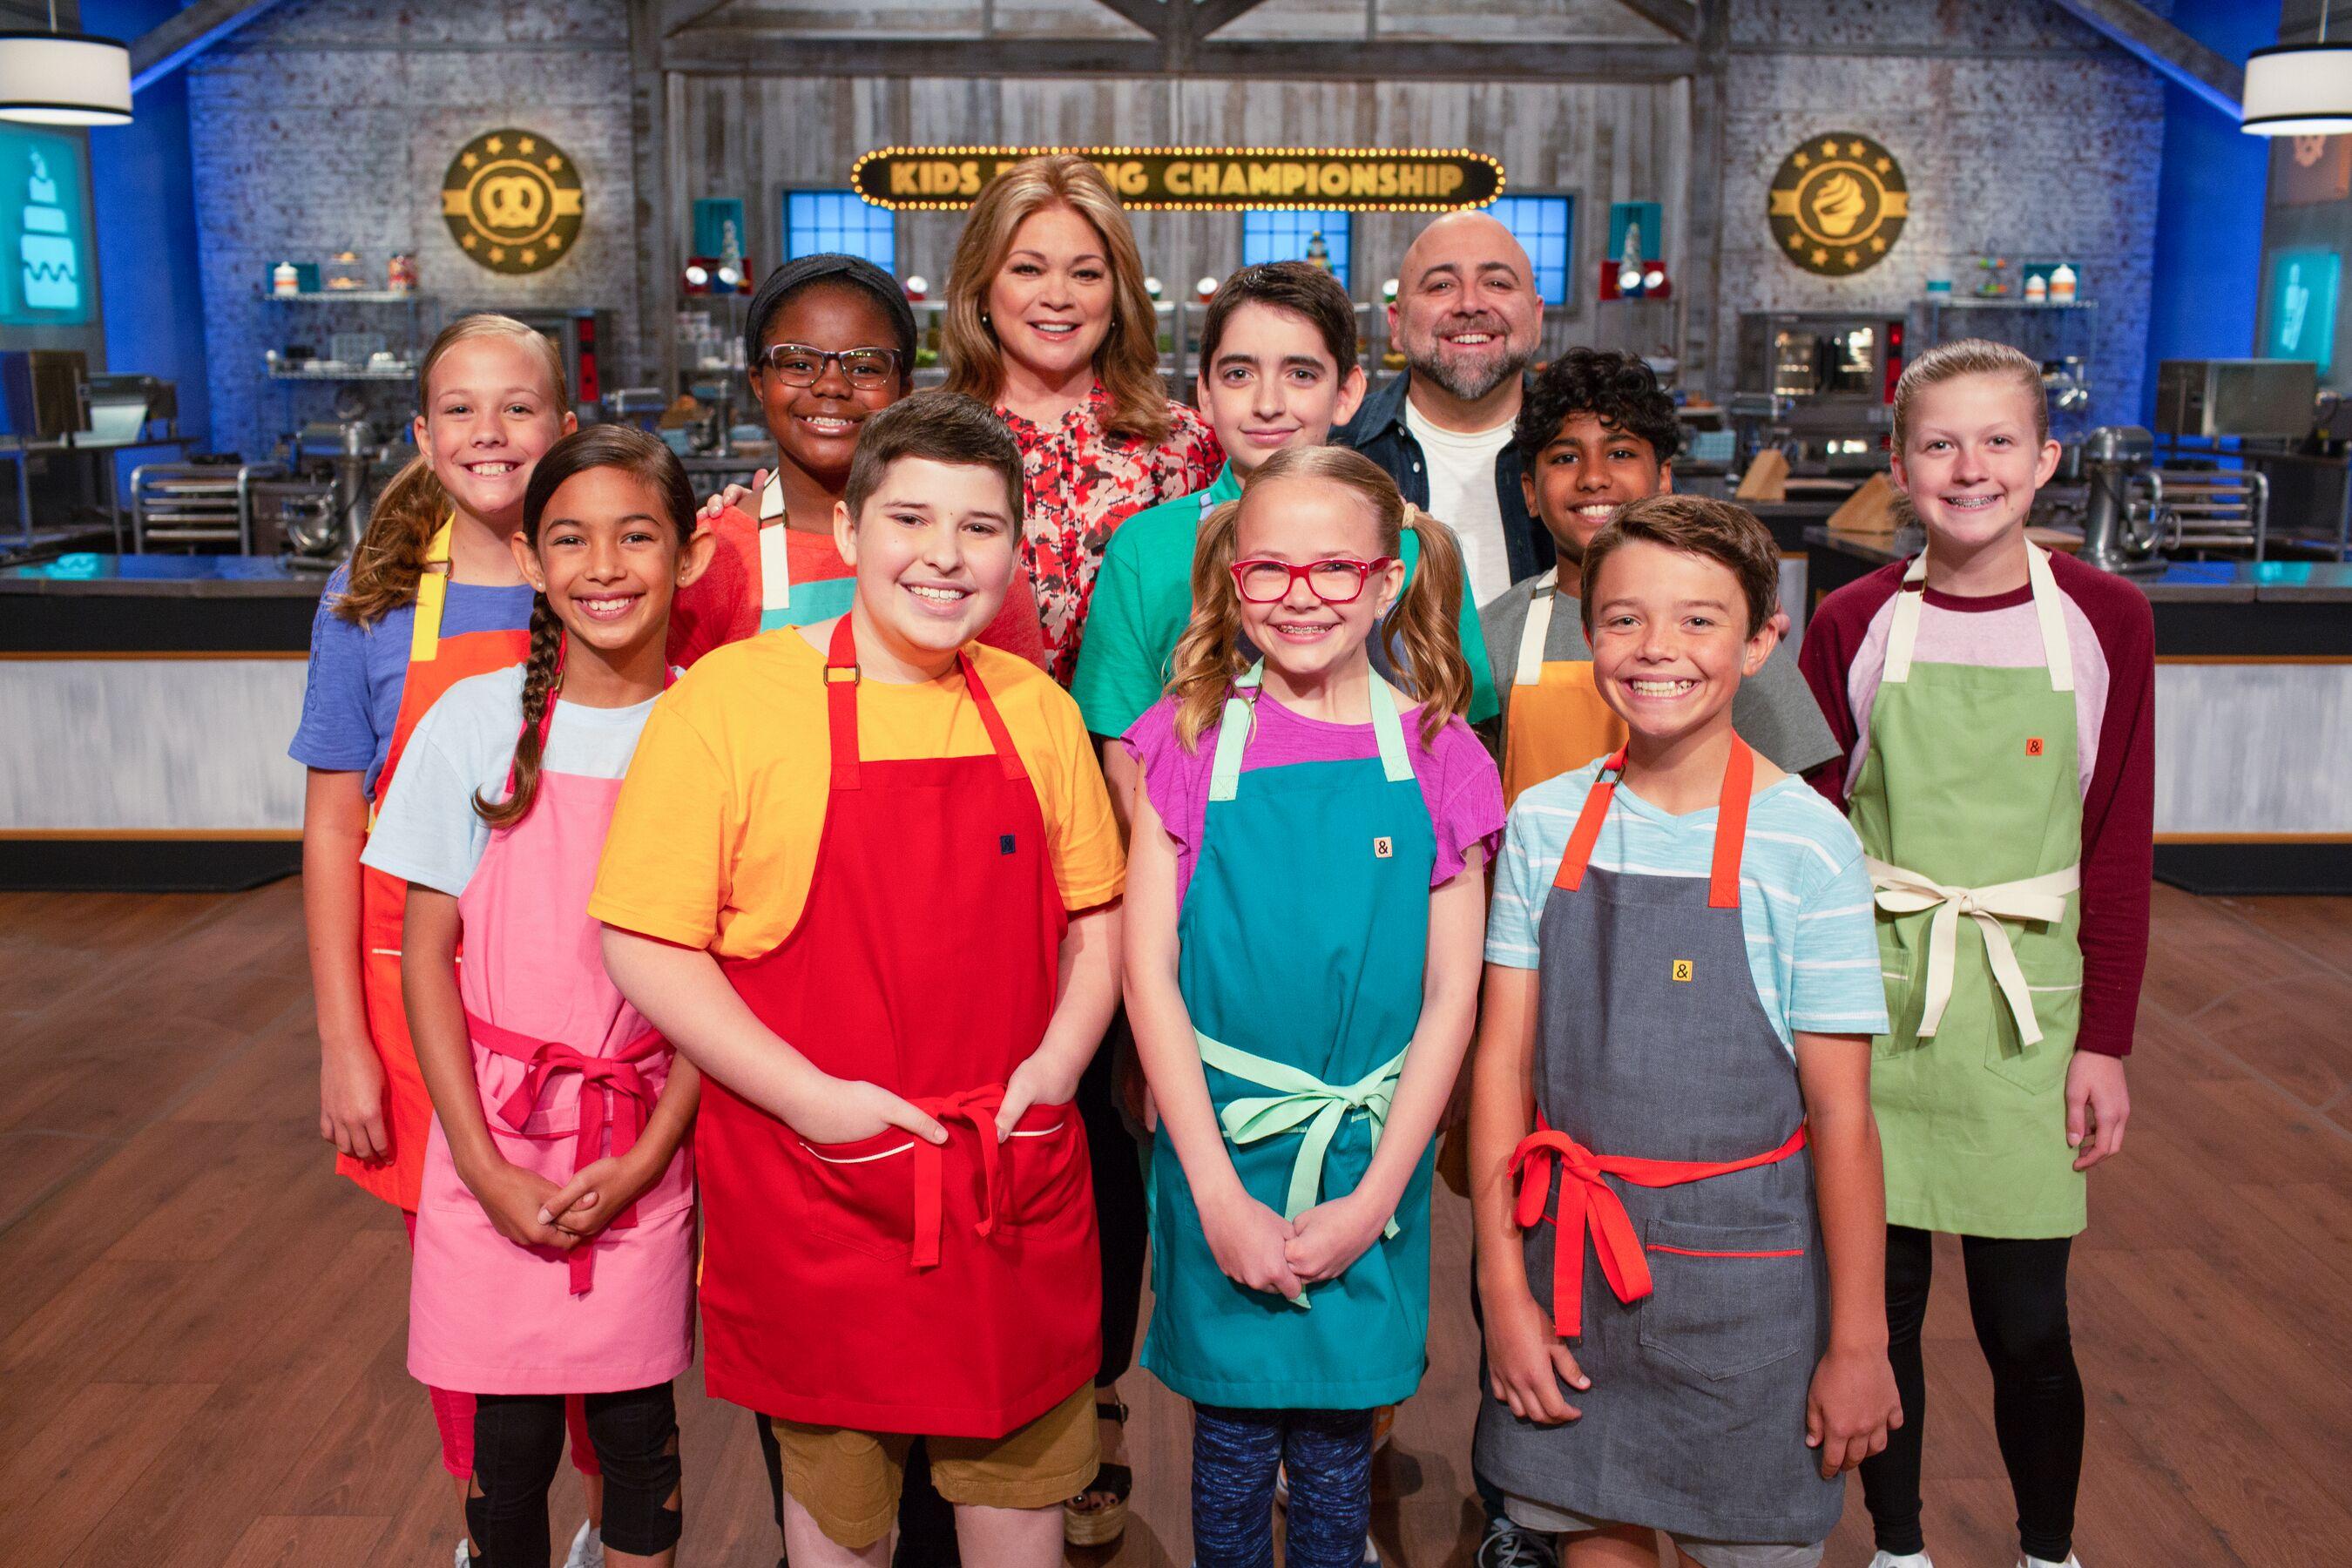 Kids Baking Championship Season 7 episode 3 preview: Is that a doughnut?